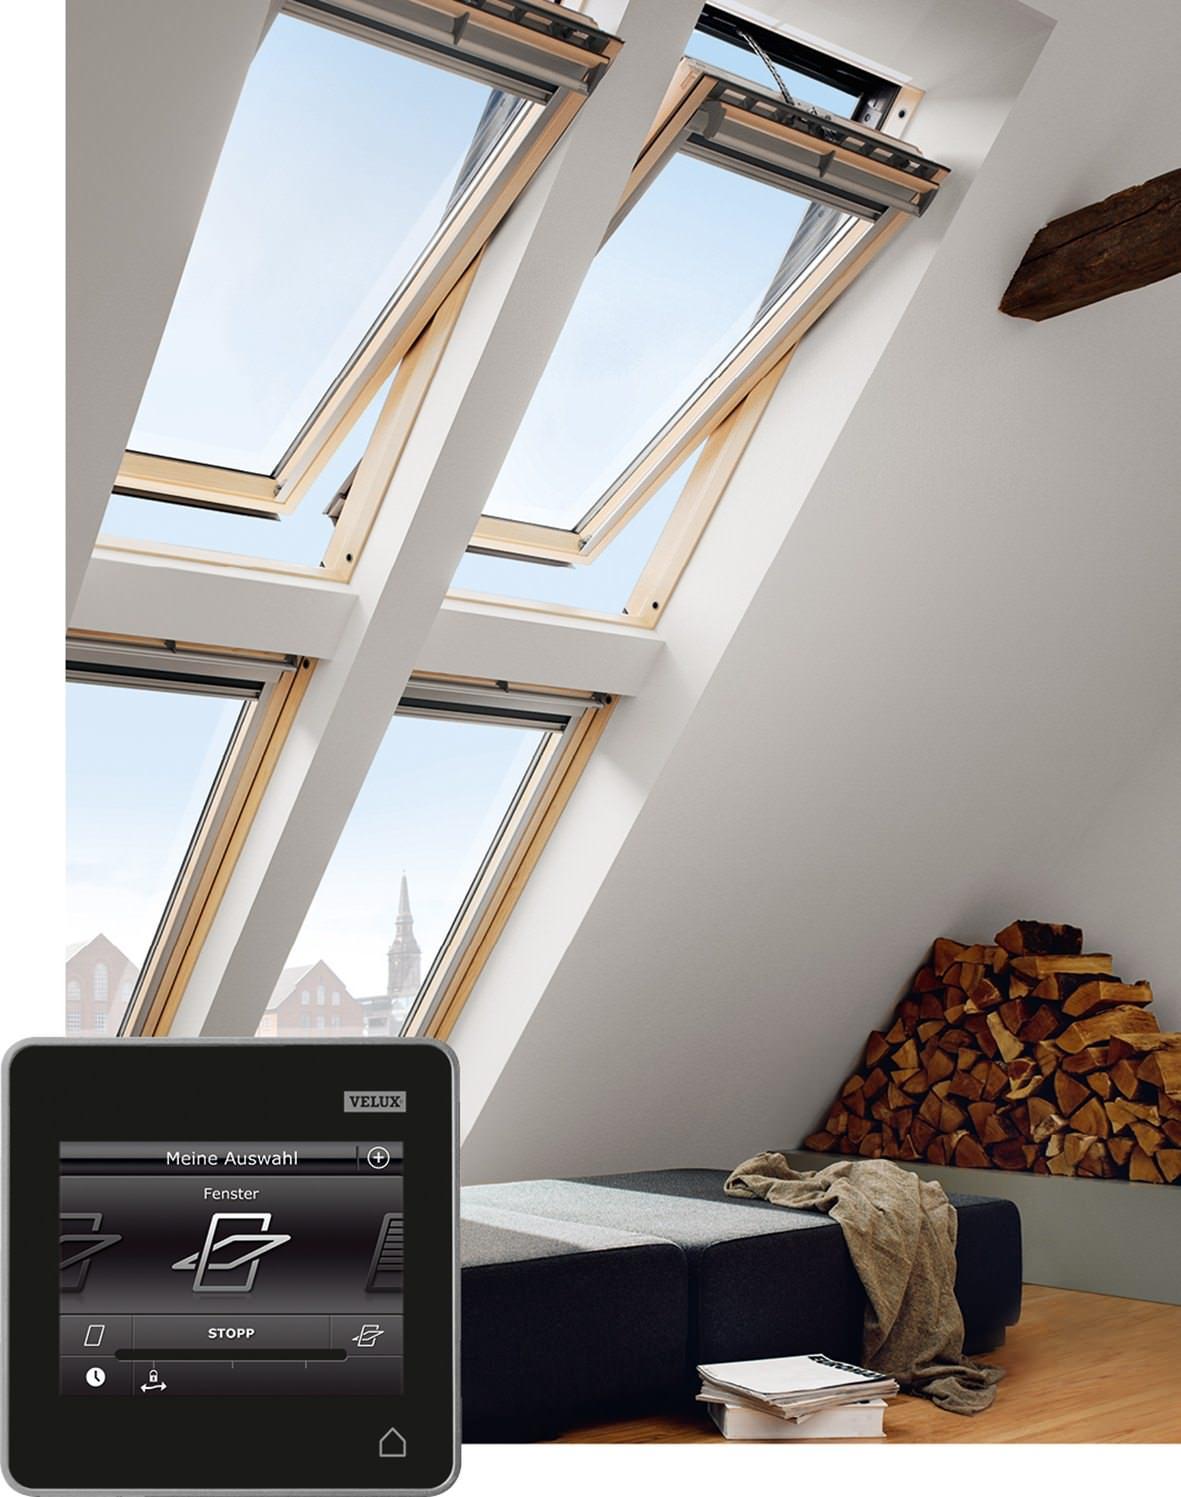 velux dachfenster ggl 306221 holz integra elektrofenster klar lackiert energie schallschutz alumini. Black Bedroom Furniture Sets. Home Design Ideas